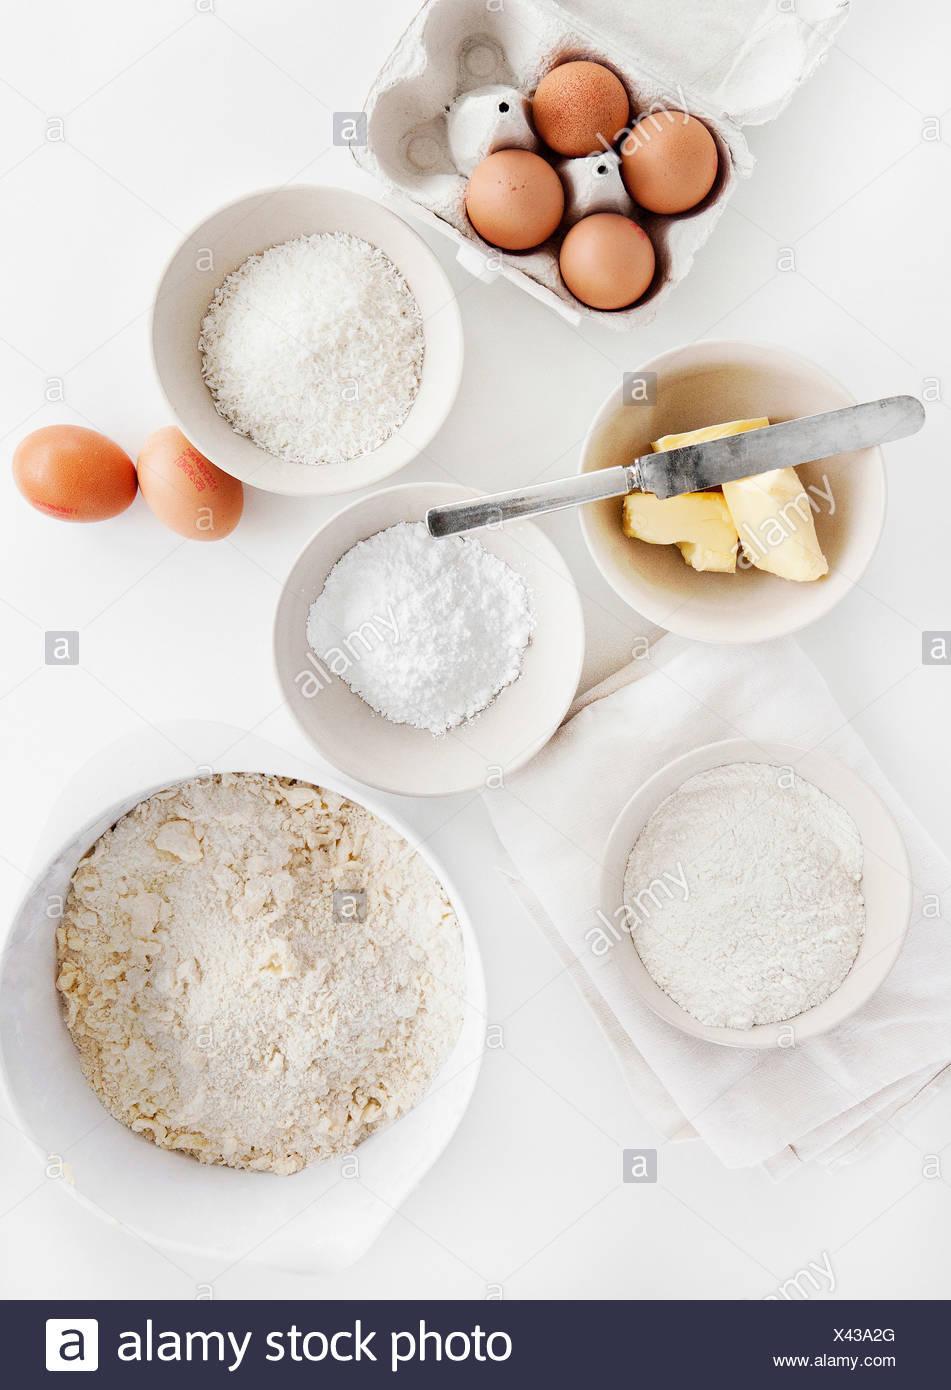 Bowls of sugar, flour, eggs, butter Stock Photo